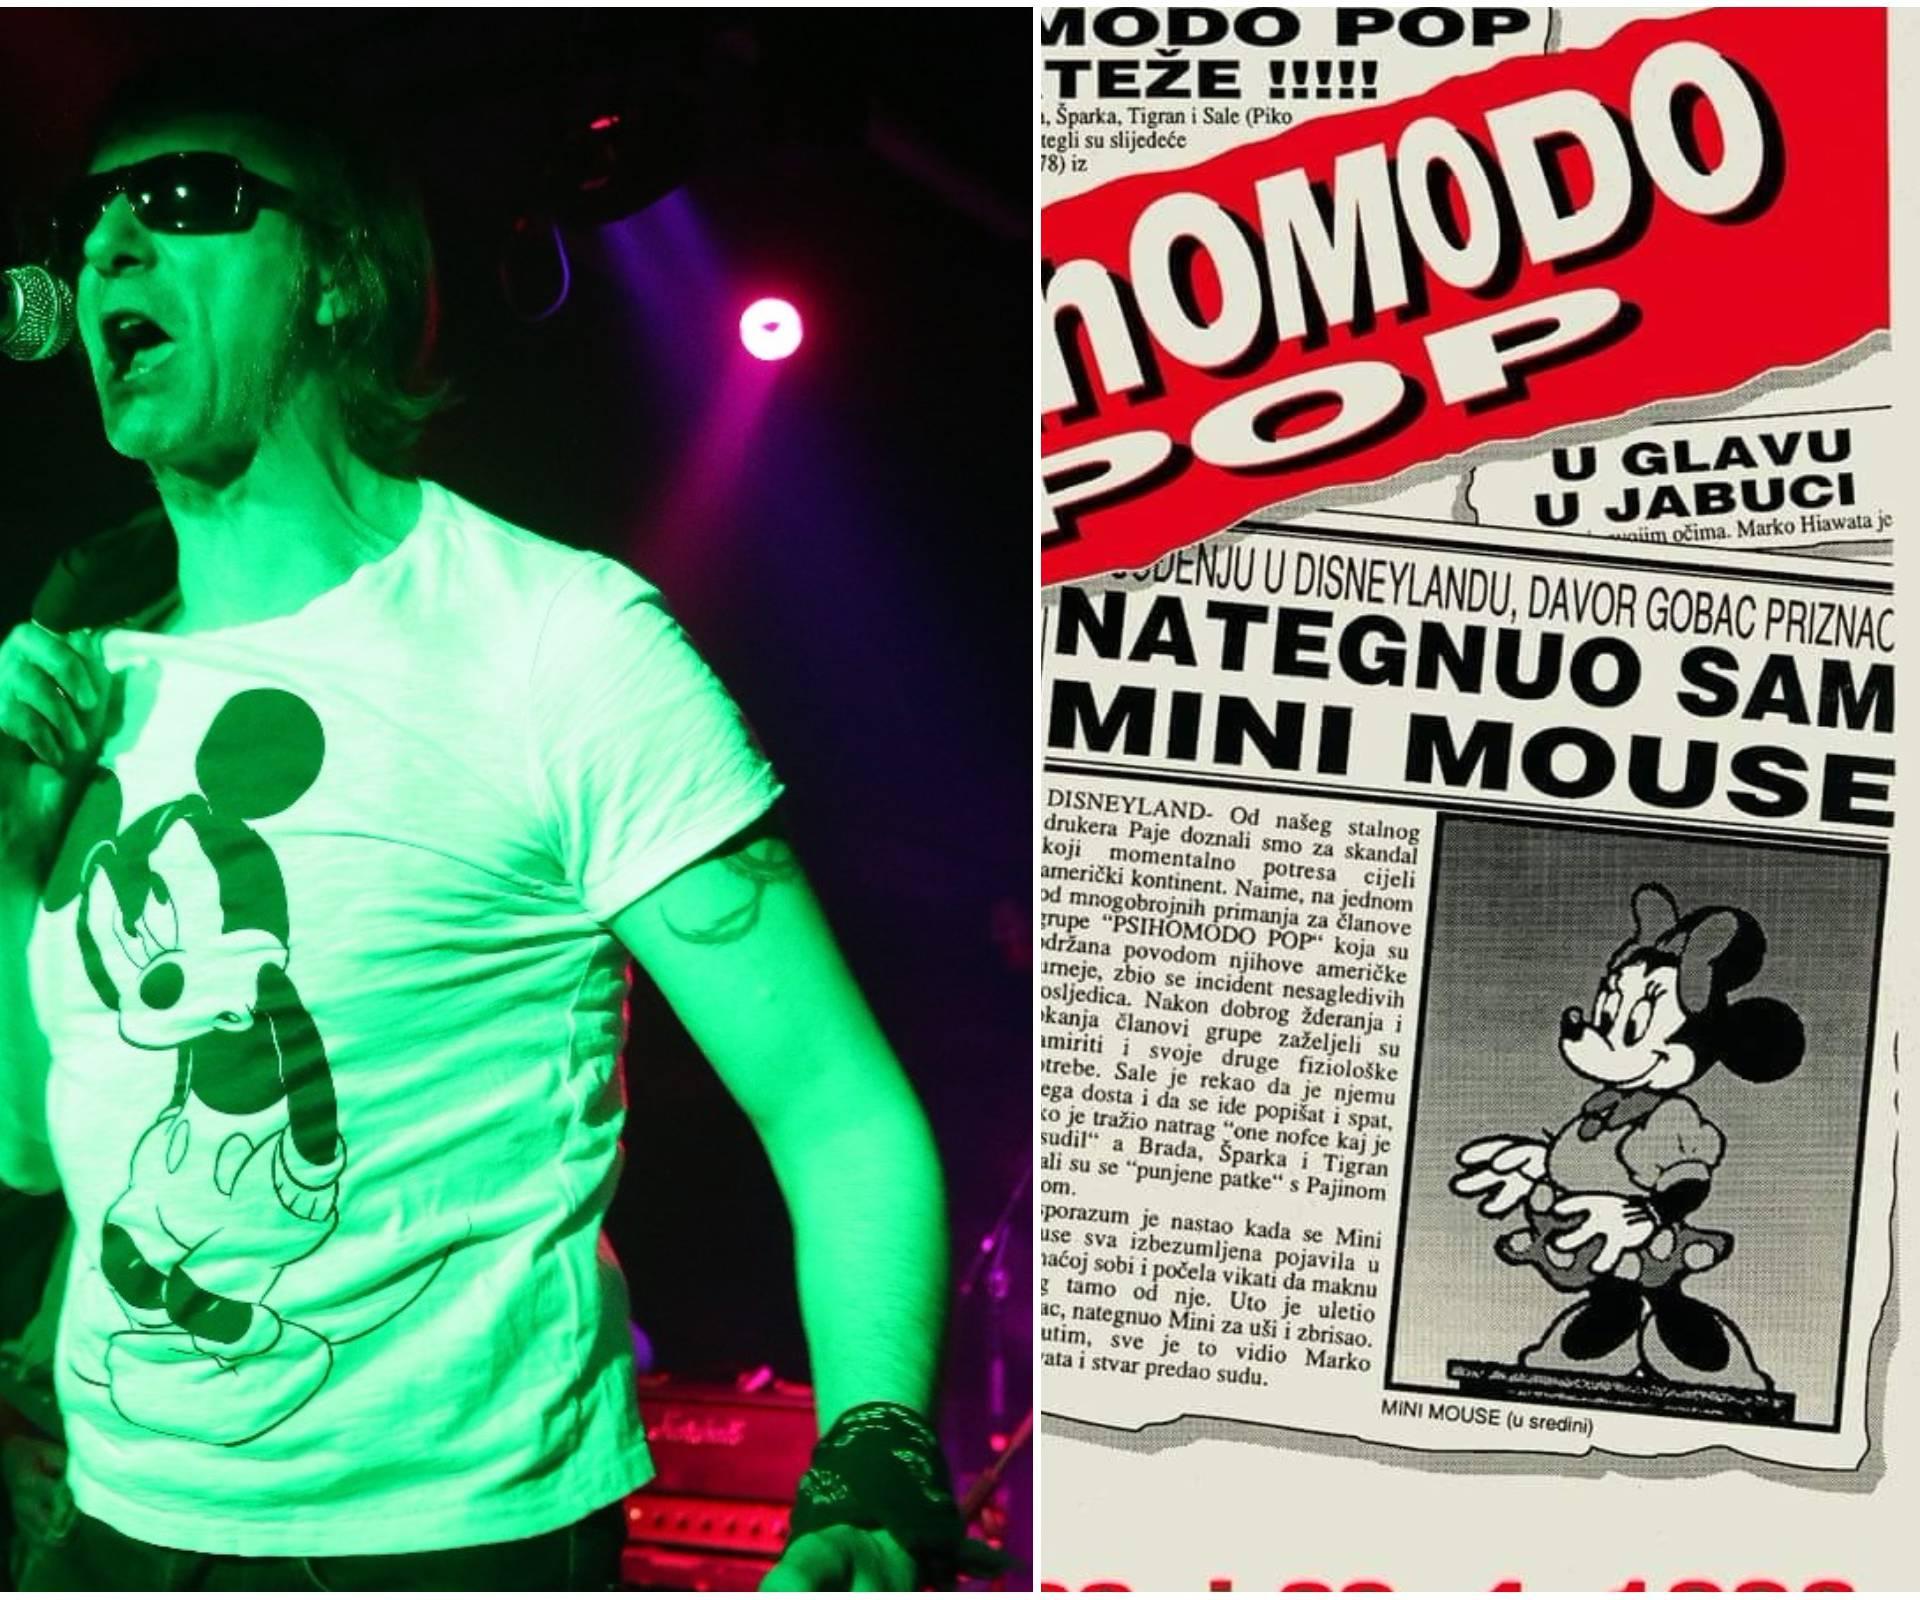 Davor Gobac nakon 25 godina opet 'nategnuo' Minnie Mouse